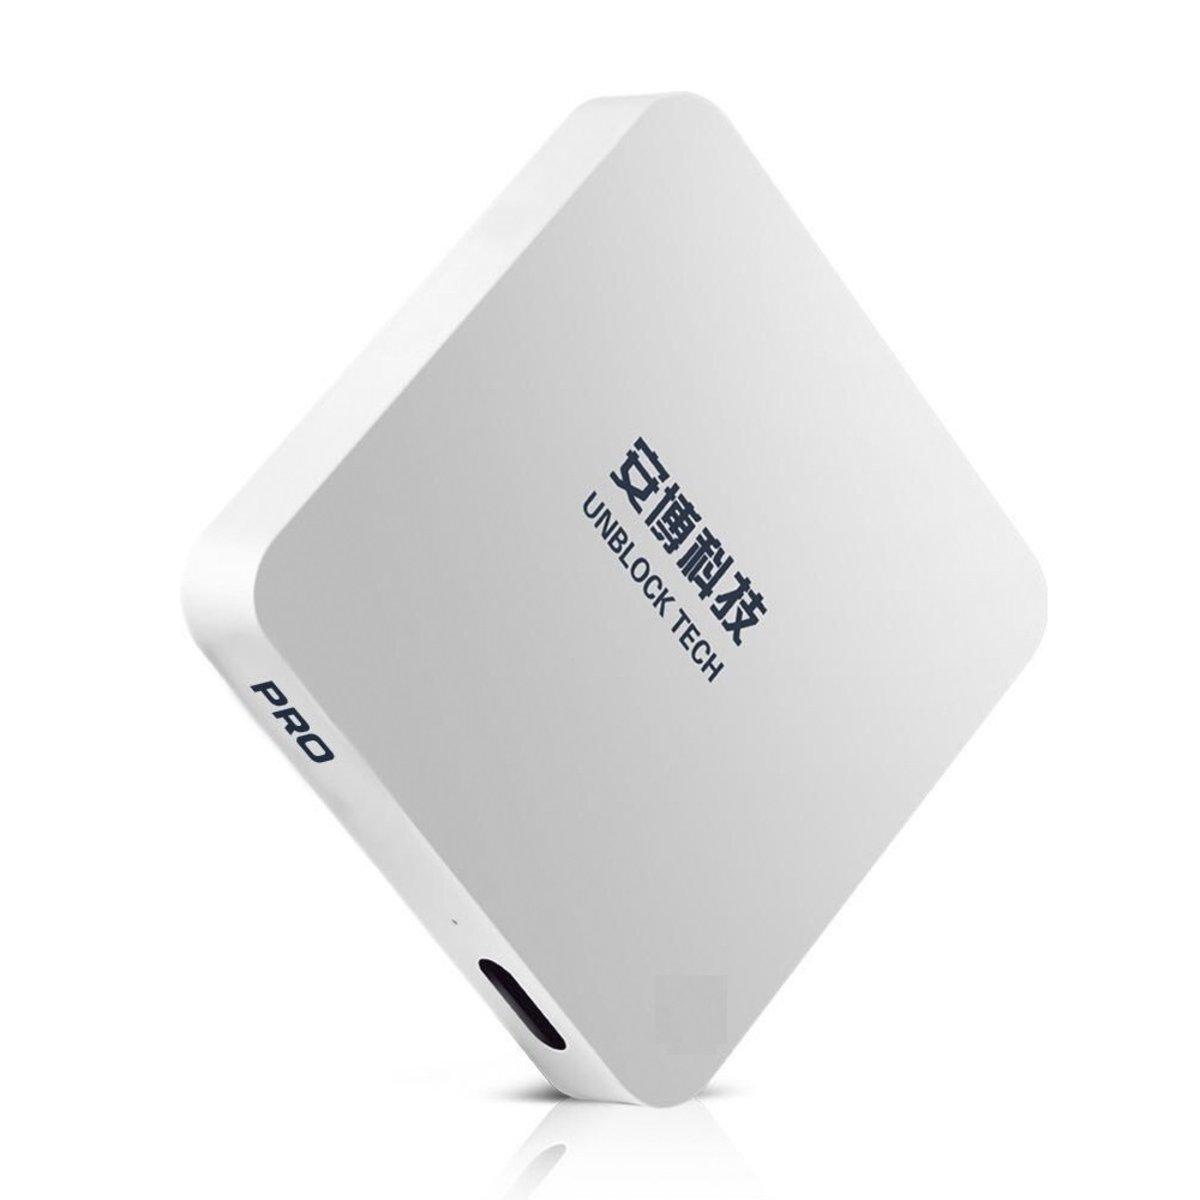 Unblock Tech Unblock Ubox Upro 2 16g 4k Hdmi 1080p Hk Hktvmall